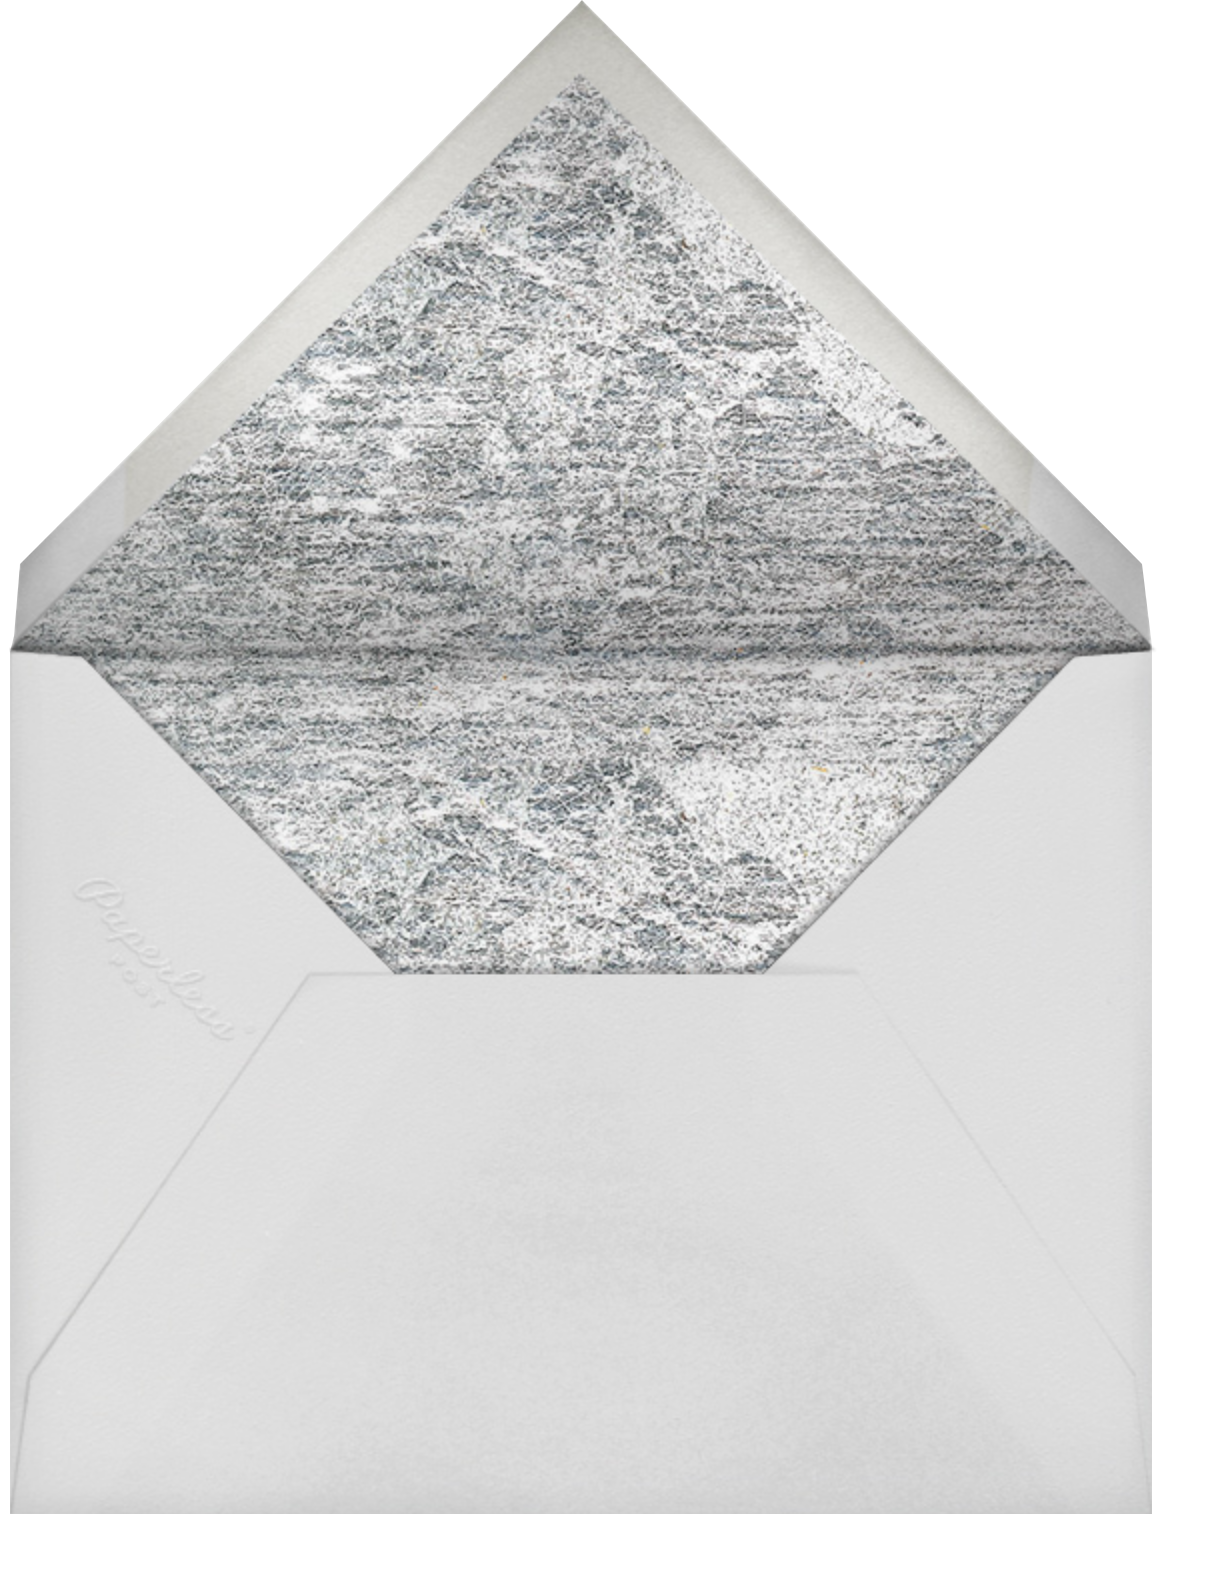 Jubilee (Photo) - Silver - Kelly Wearstler - Adult birthday - envelope back